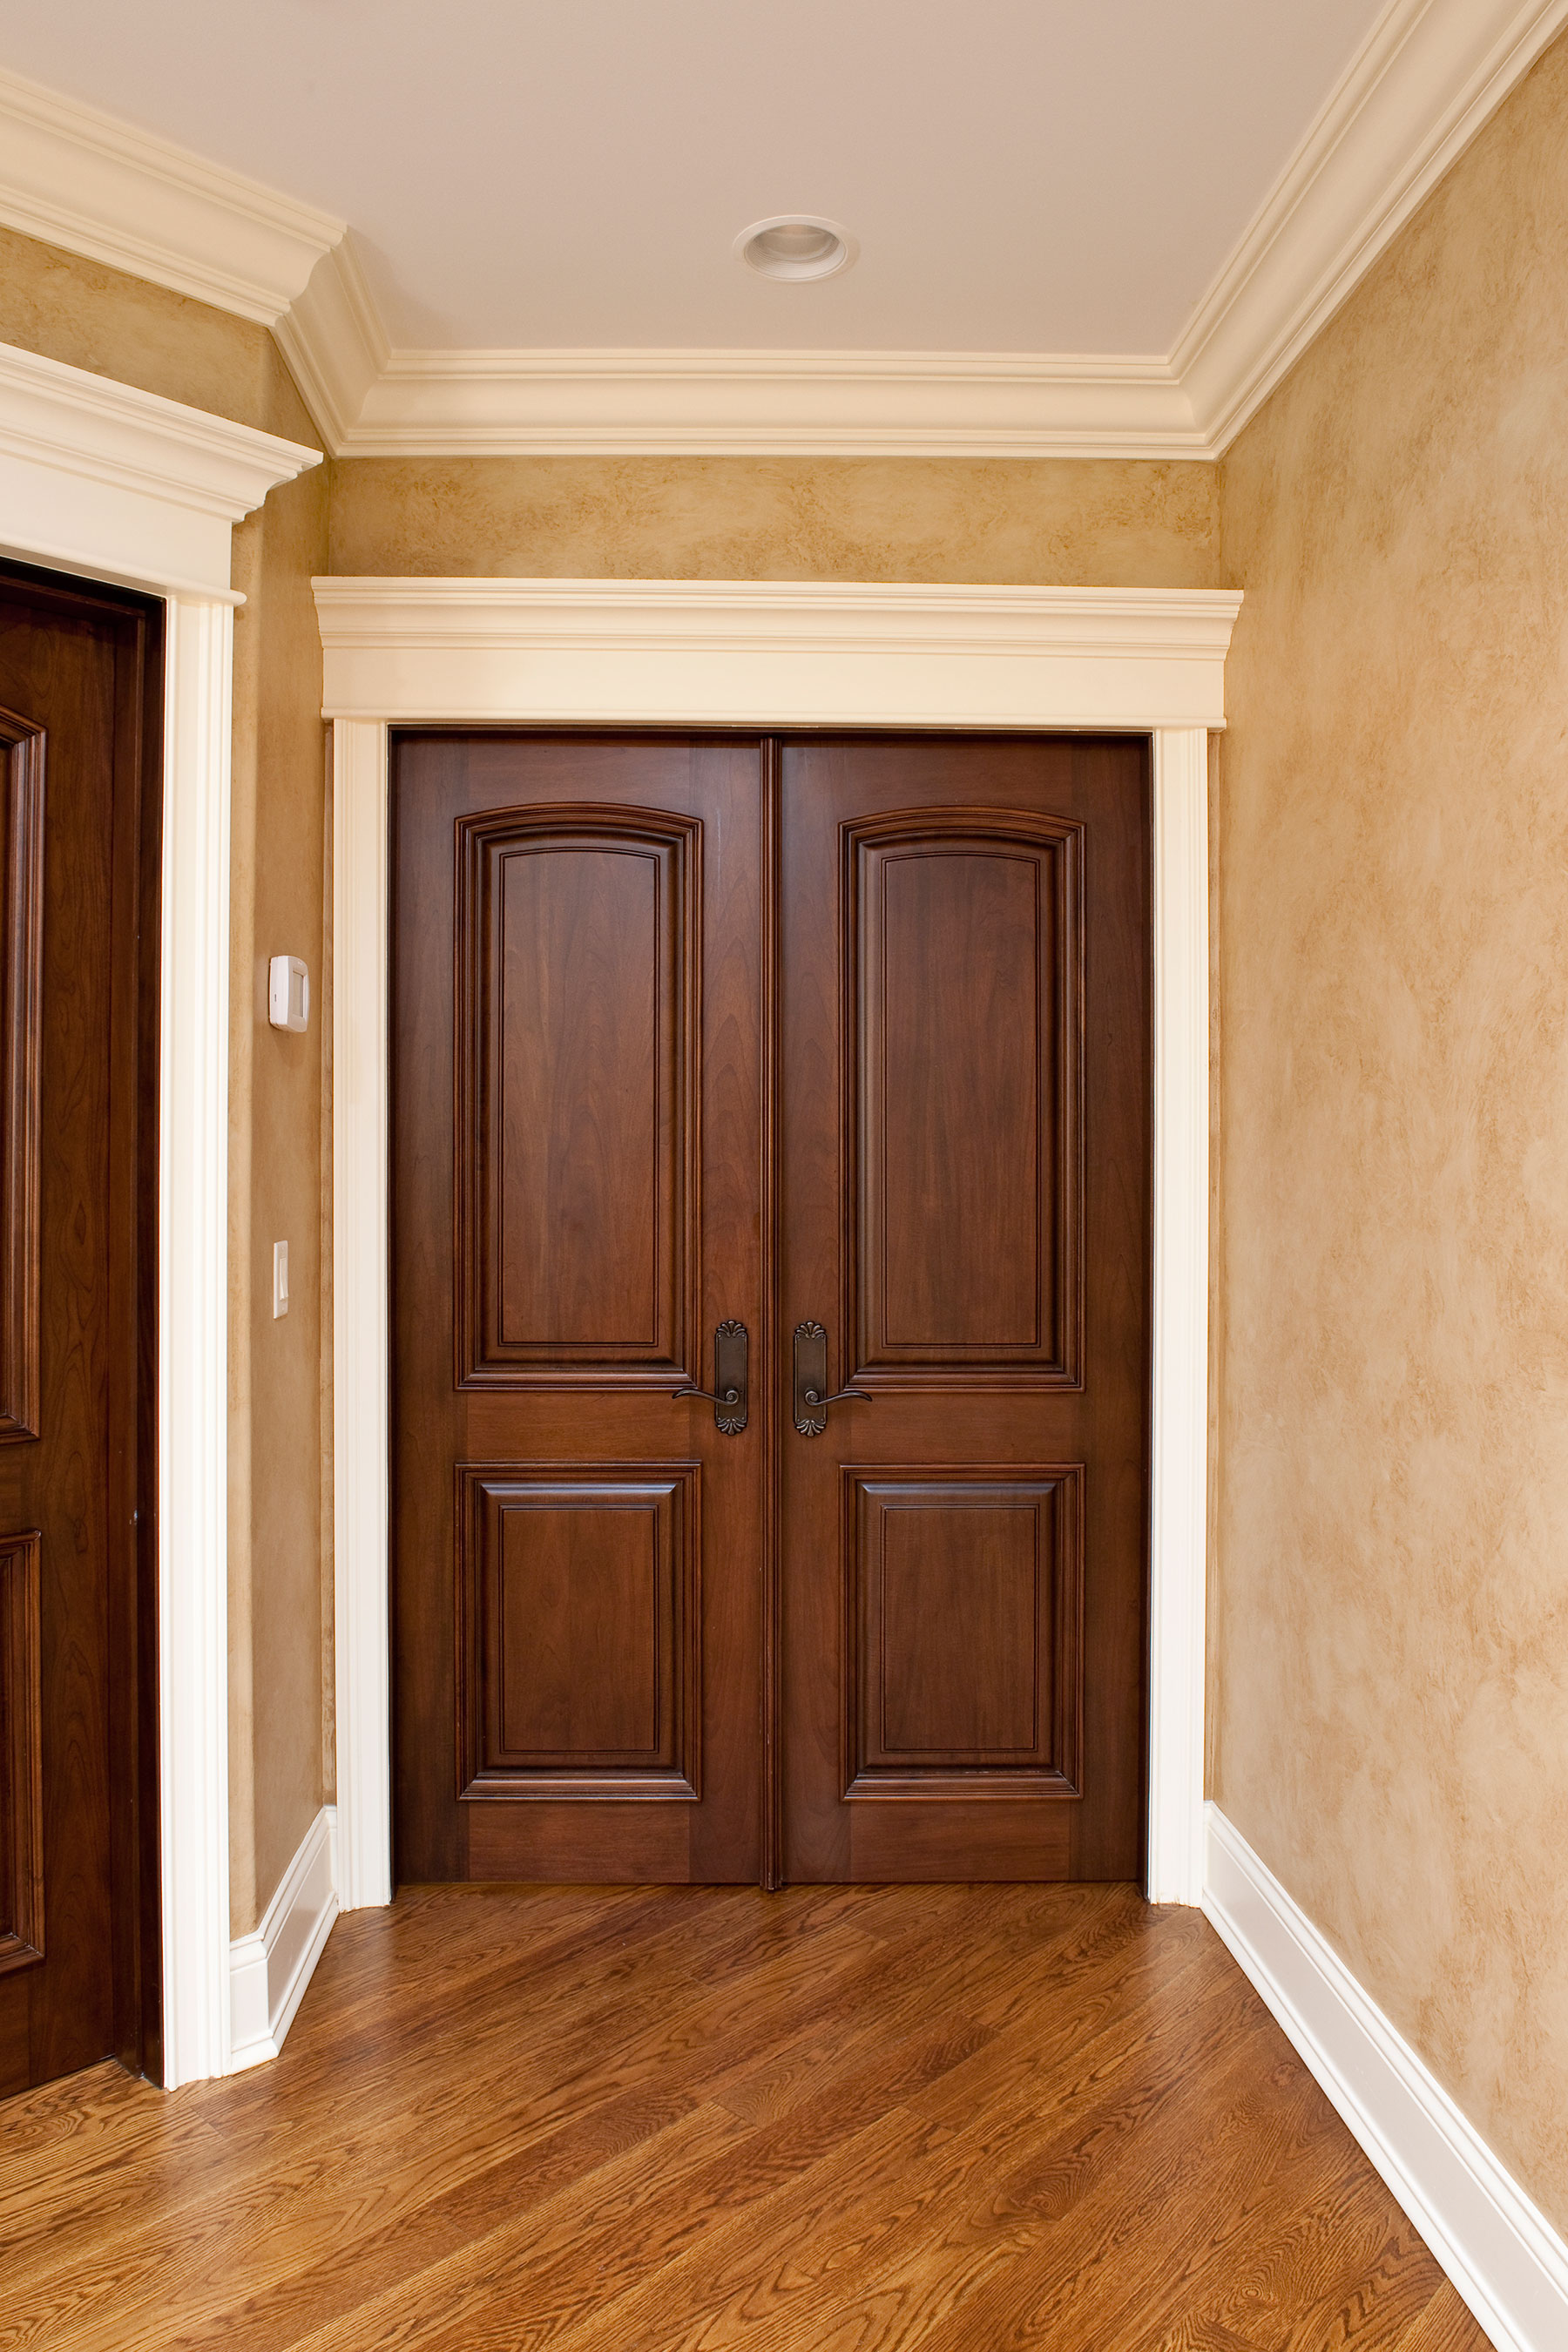 Bedroom Door Decorations Classical: Solid Wood With Walnut